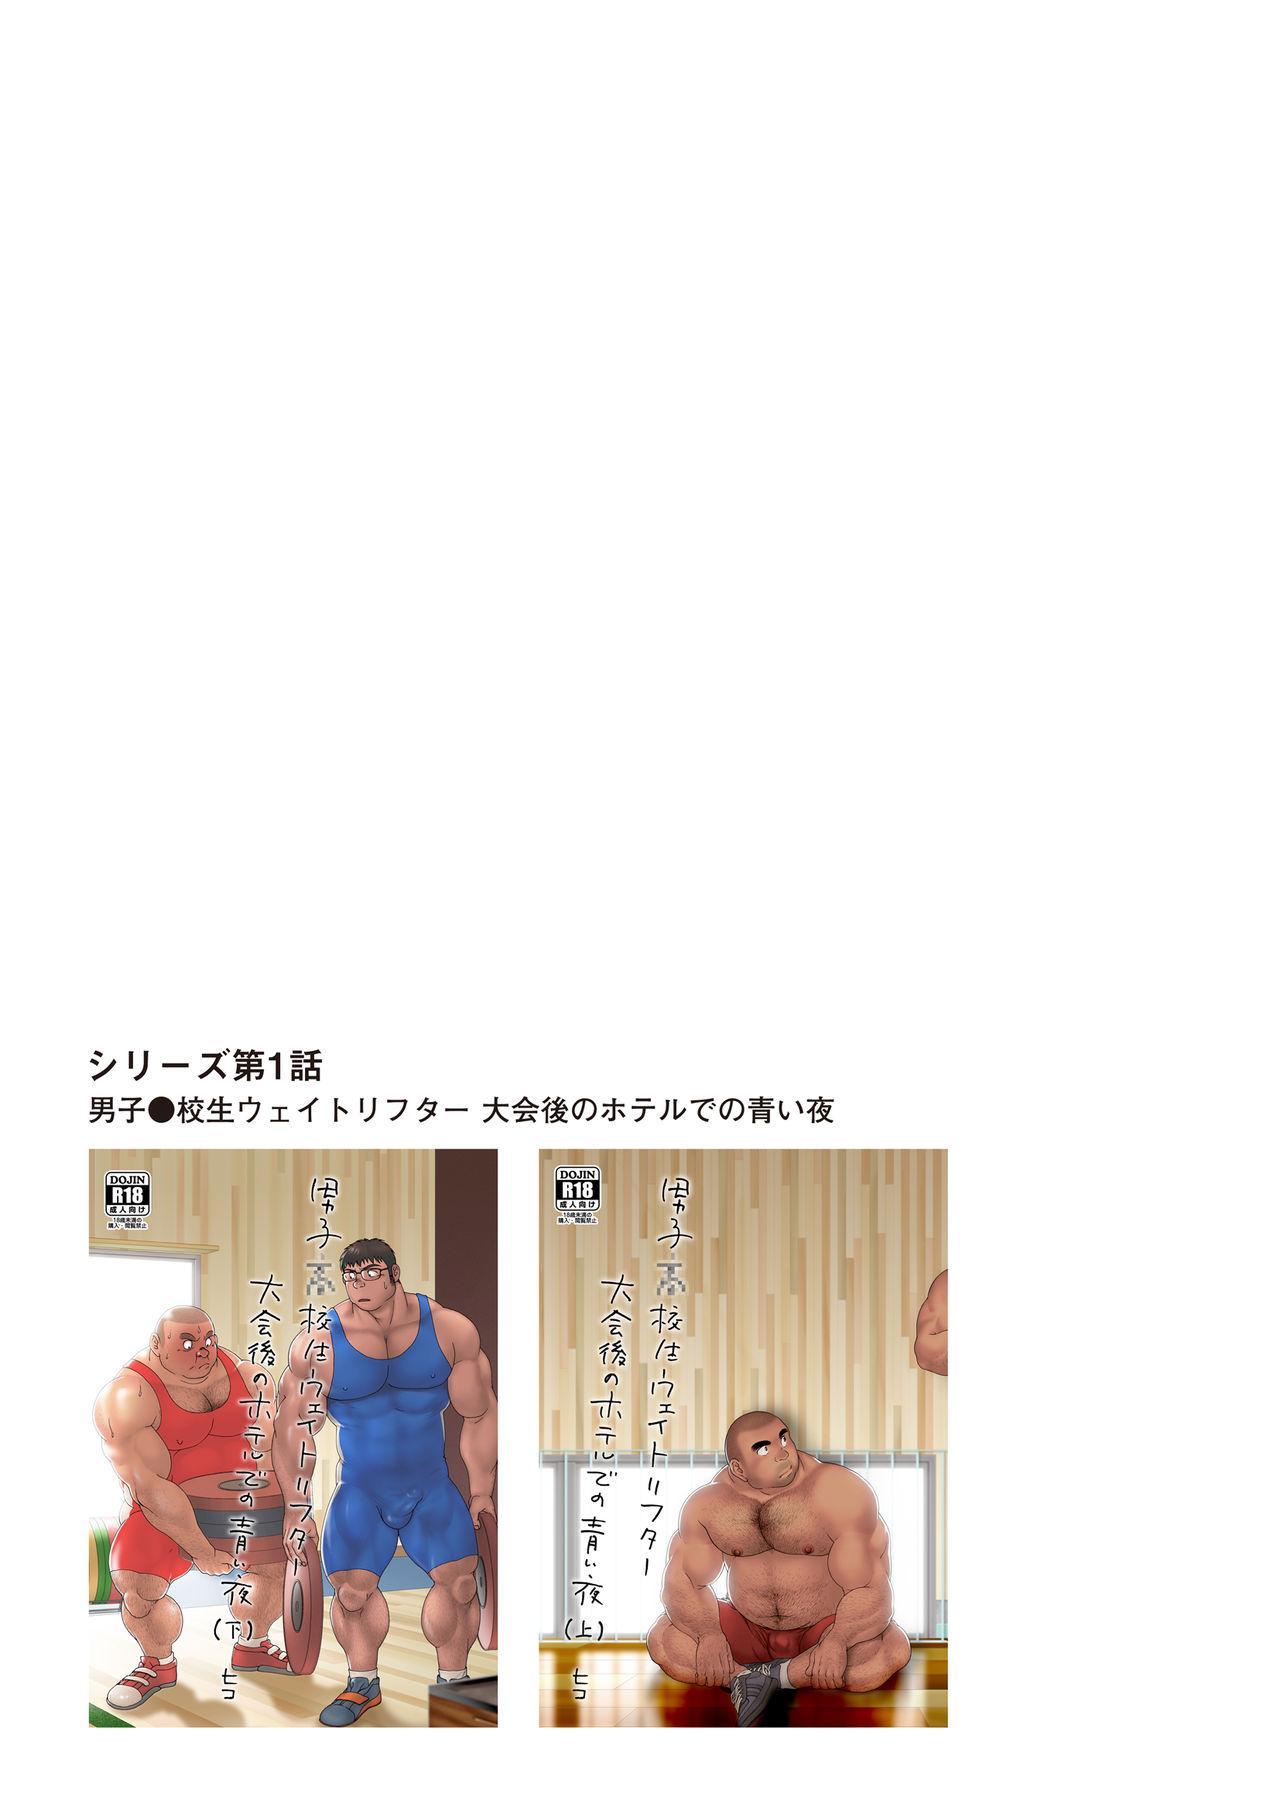 Danshi Koukousei Weightlifter Shiai-chuu, Osae kirenai Wakai Takeri 33